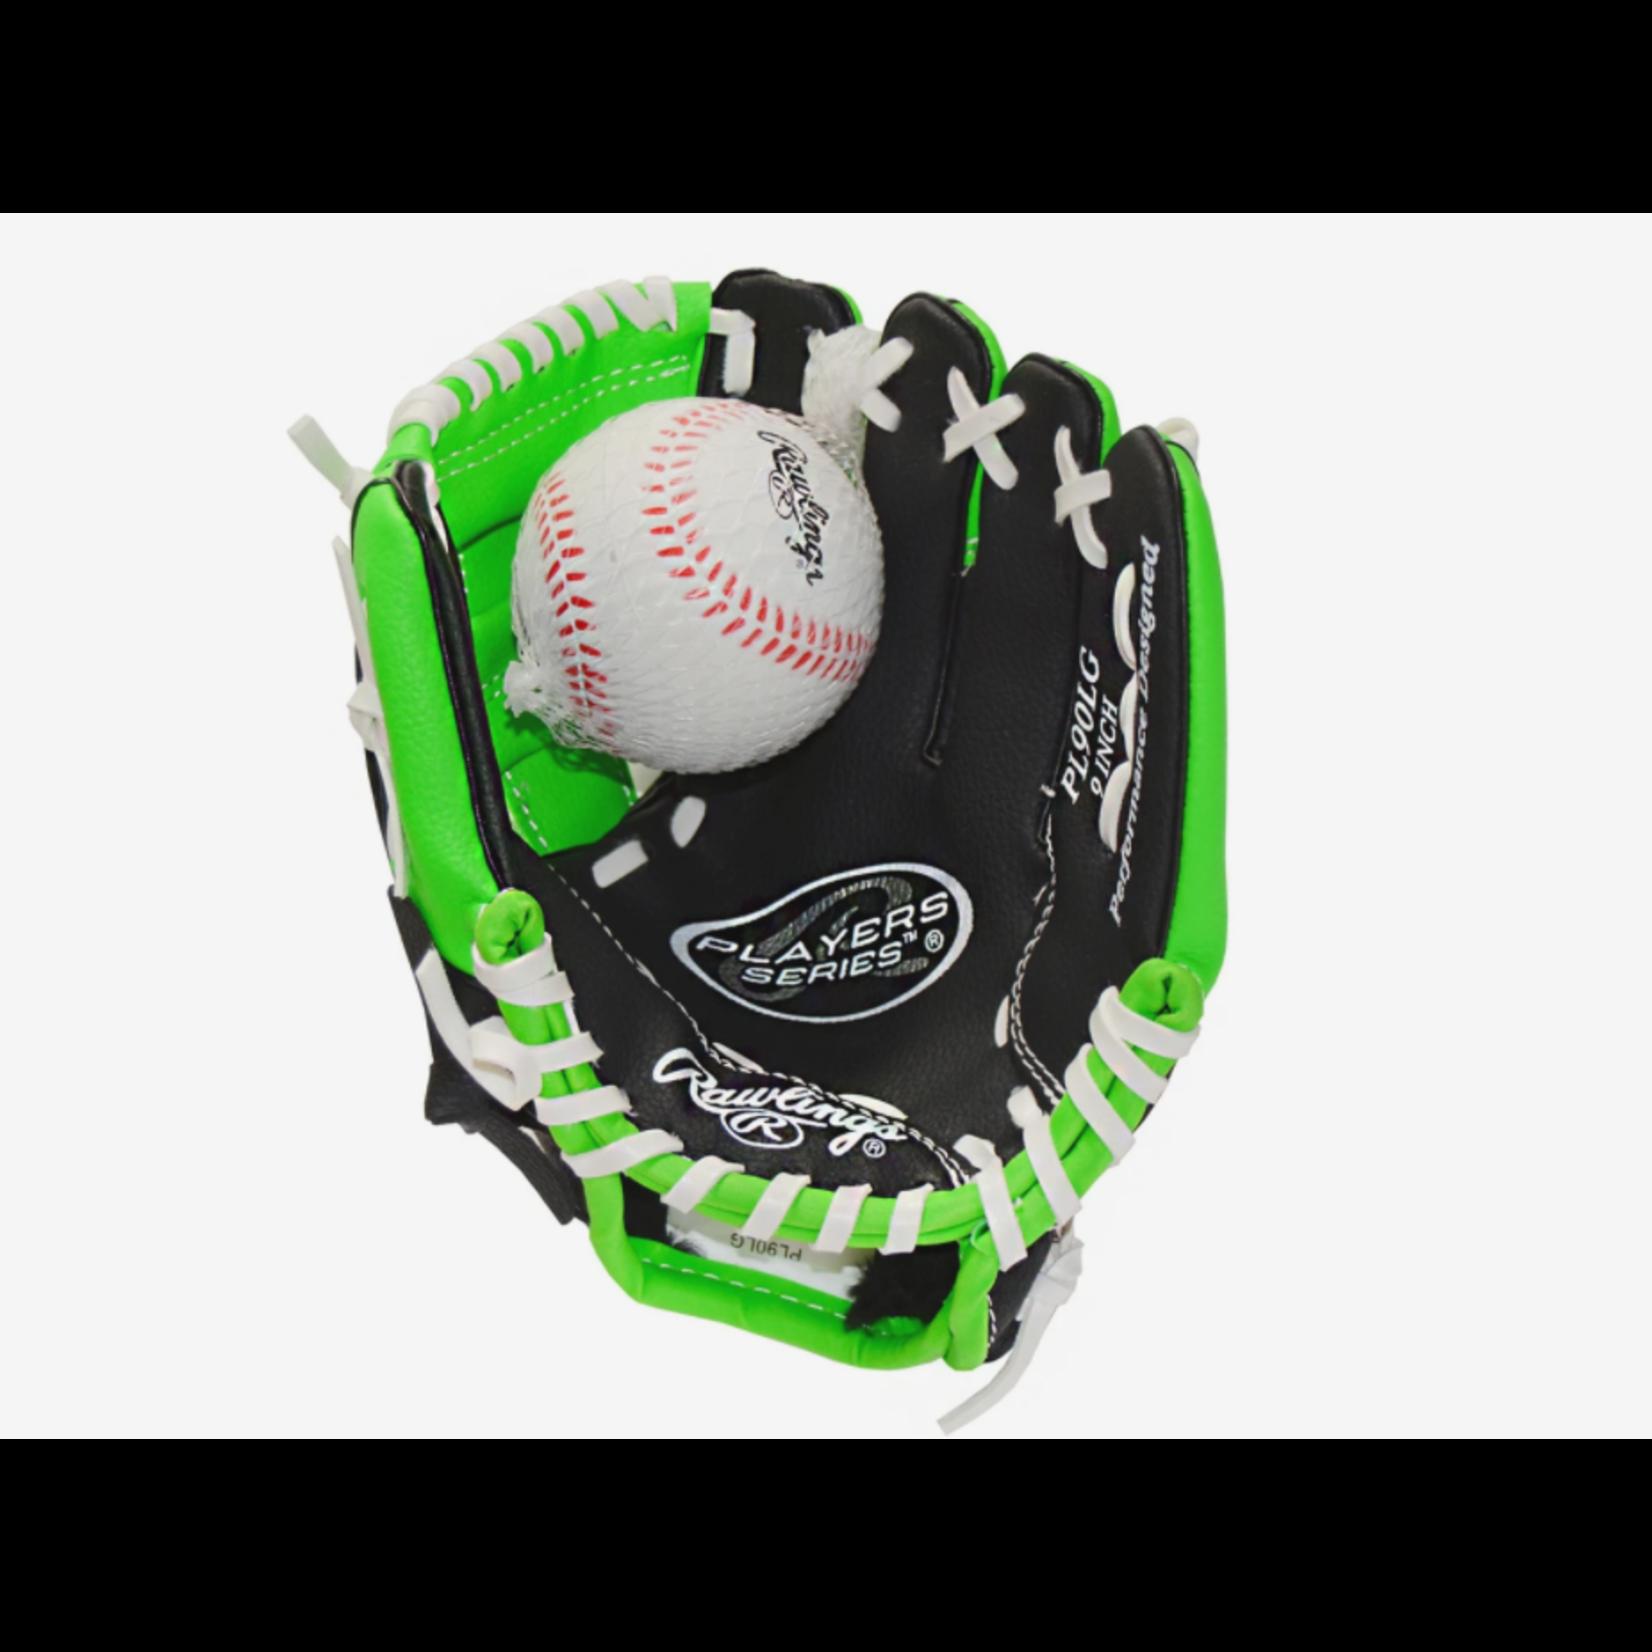 Rawlings Gant Baseball Rawllngs Players Series